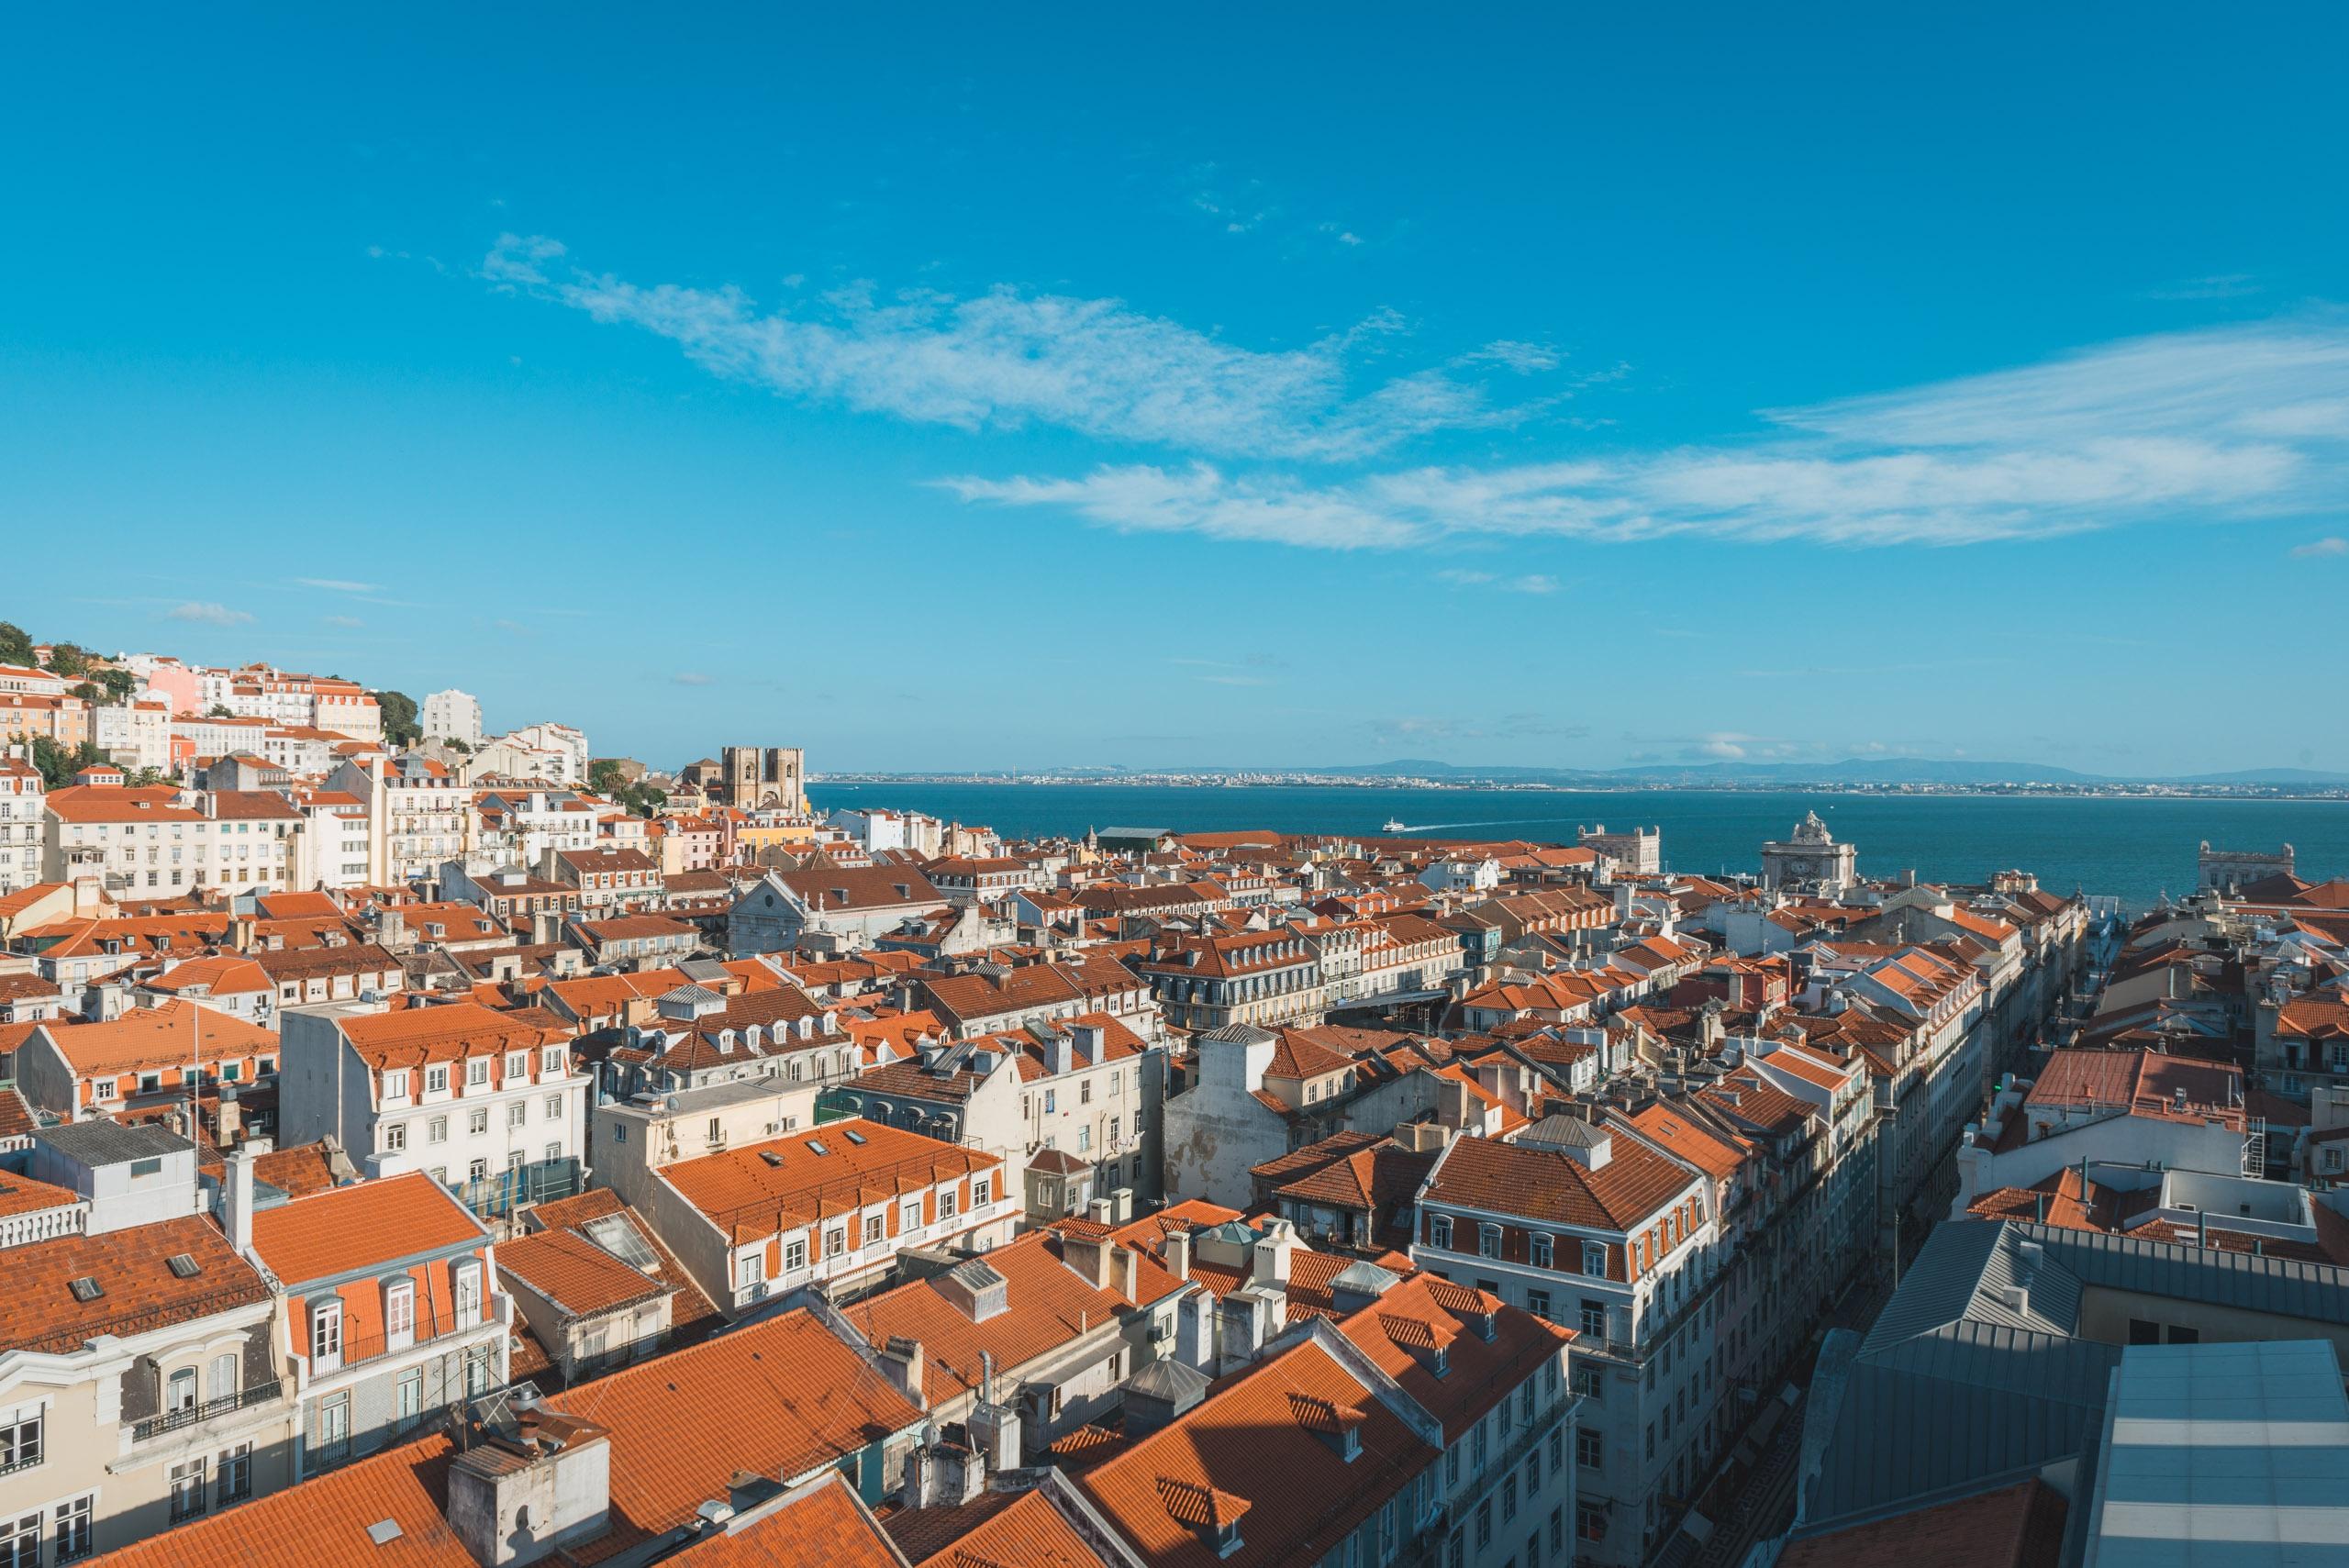 Portugal - Lisbon - 2012-0922-DSC_1456_51597